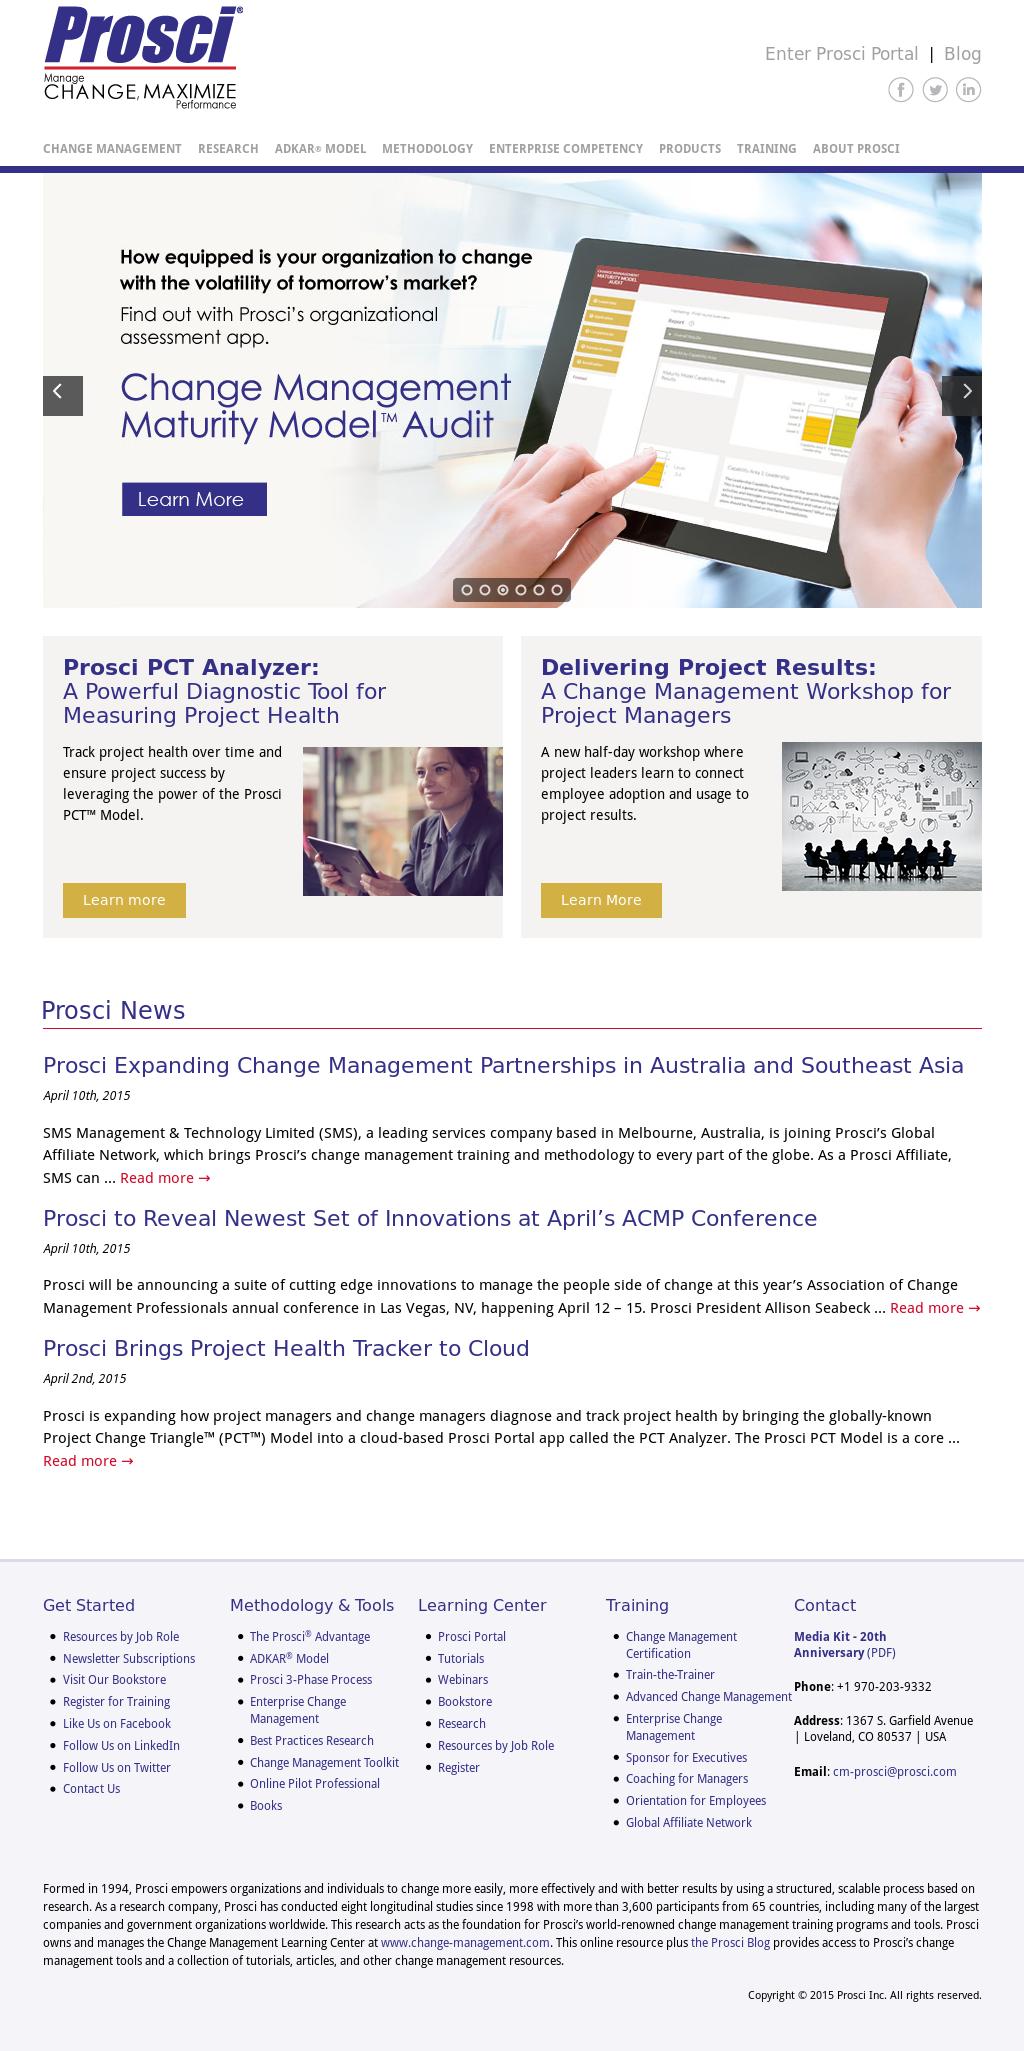 Prosci Competitors, Revenue and Employees - Owler Company Profile